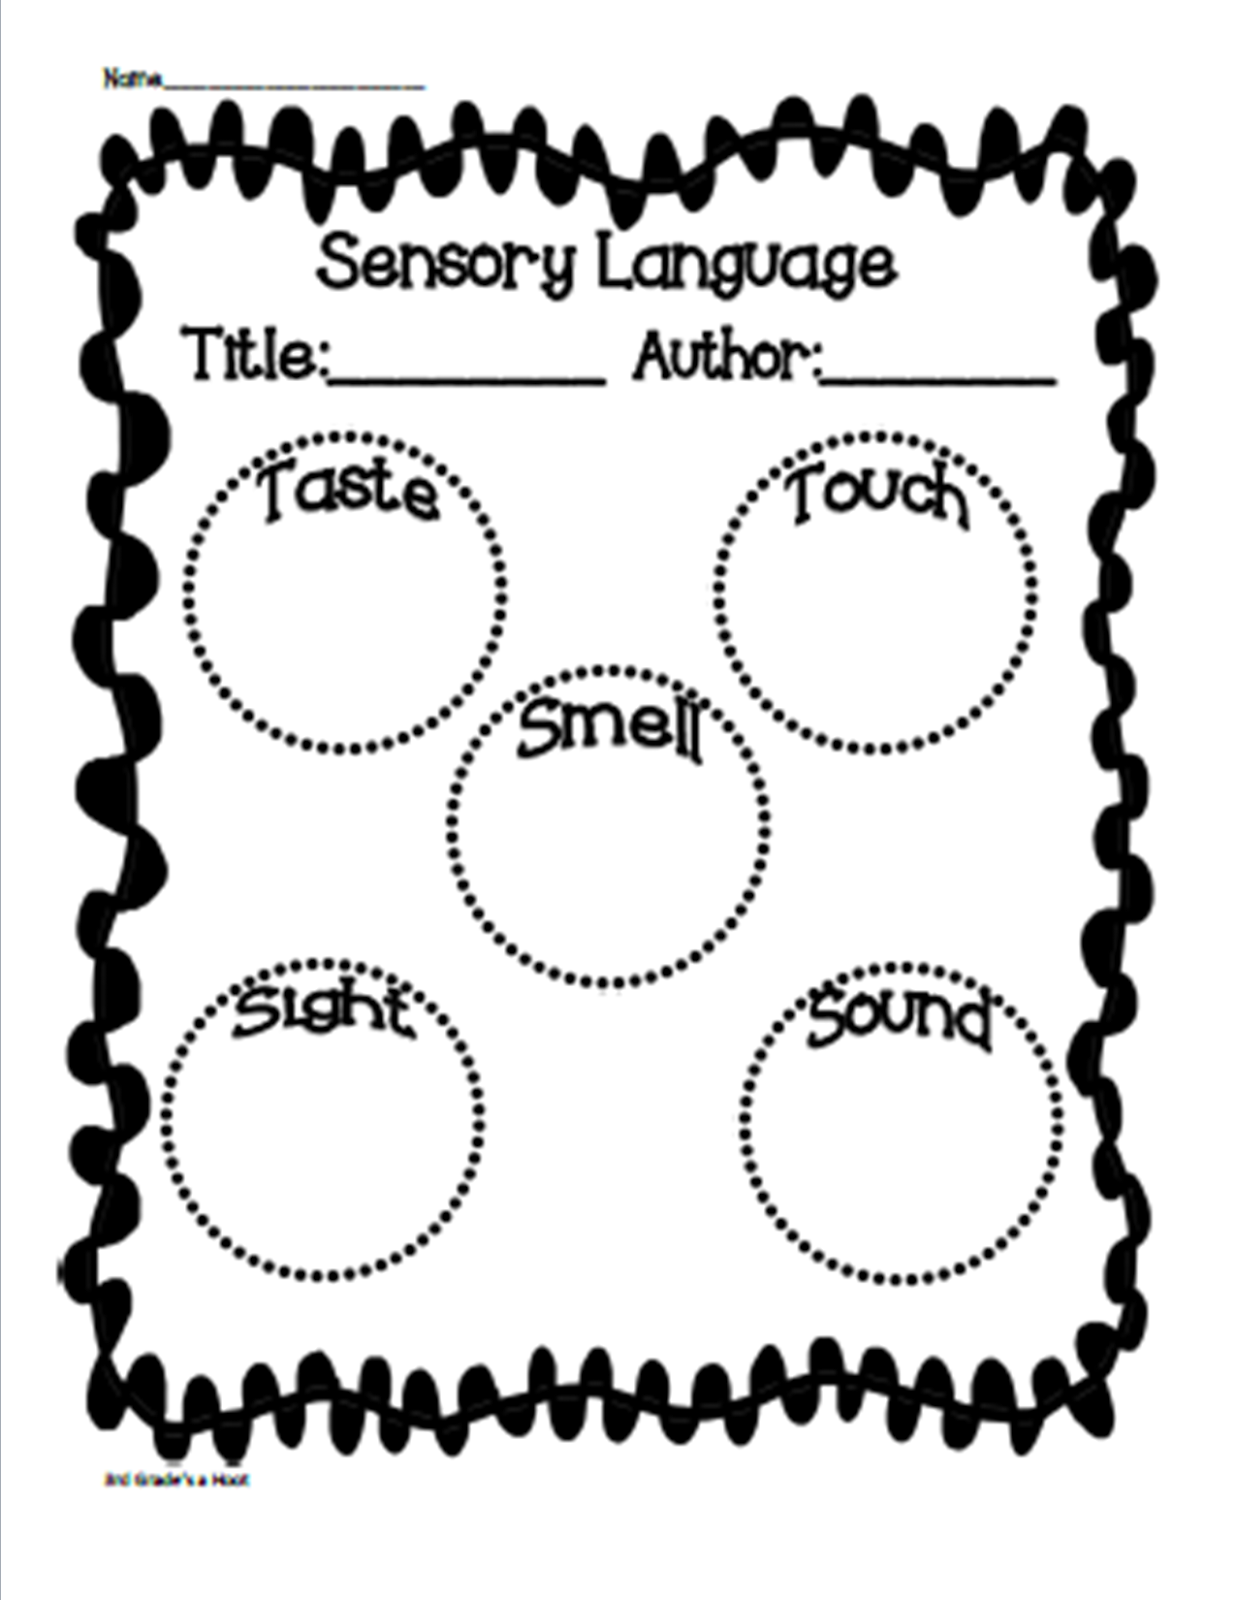 hight resolution of Sensory Language Freebie-3rd Grade's a Hoot   Graphic organizers